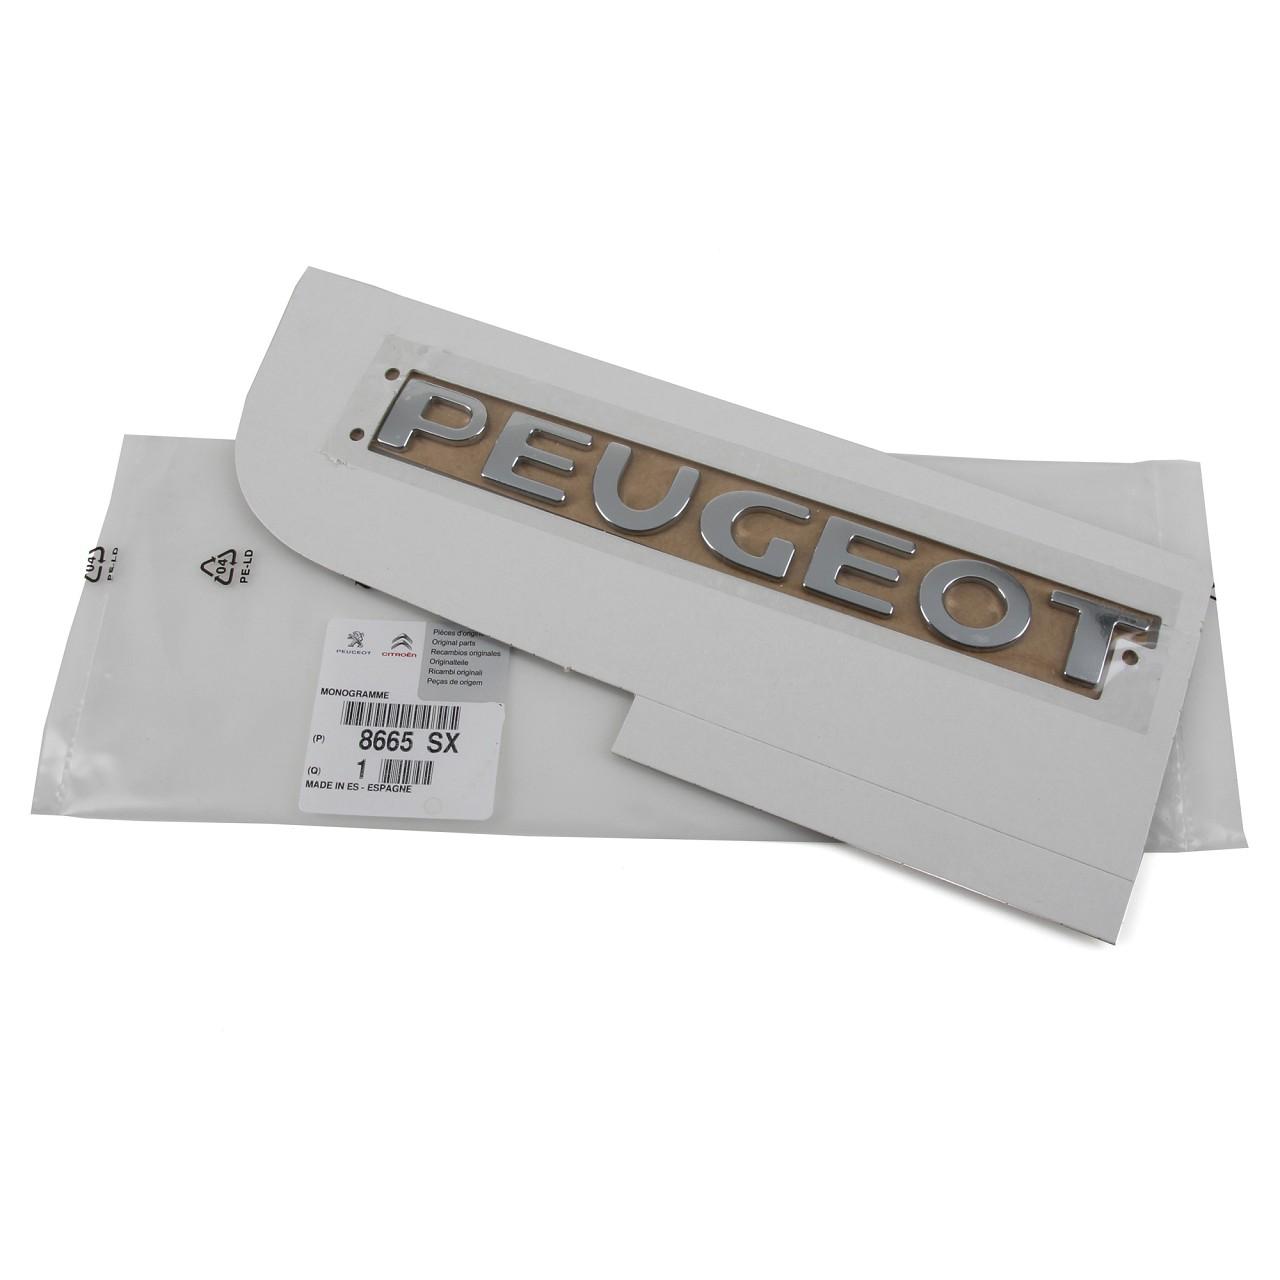 ORIGINAL Peugeot Emblem Plakette Schriftzug Heckklappe CHROM 8665.SX für 207 SW